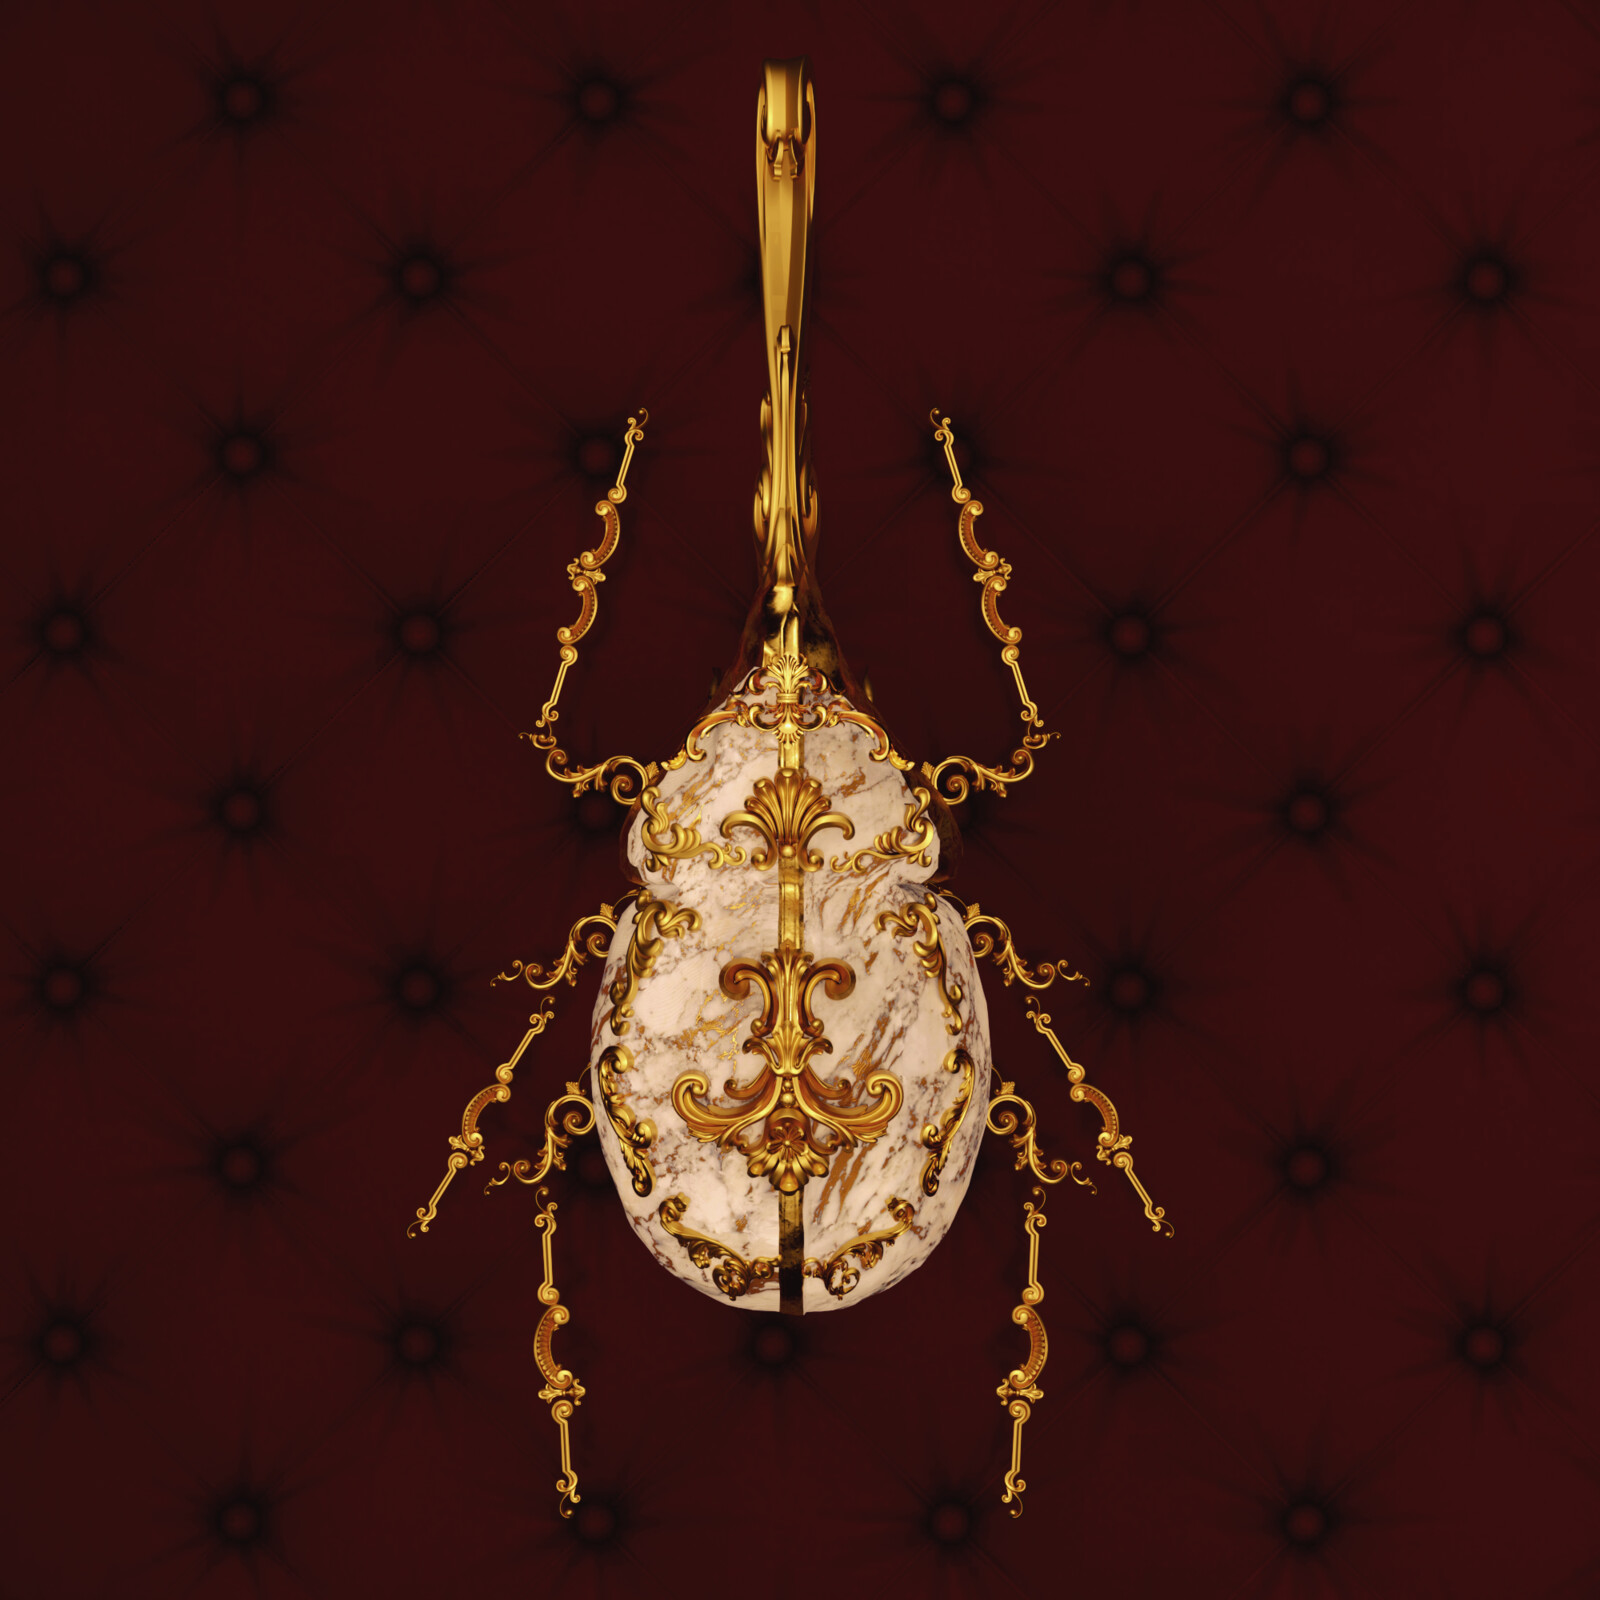 Entomologists Prize